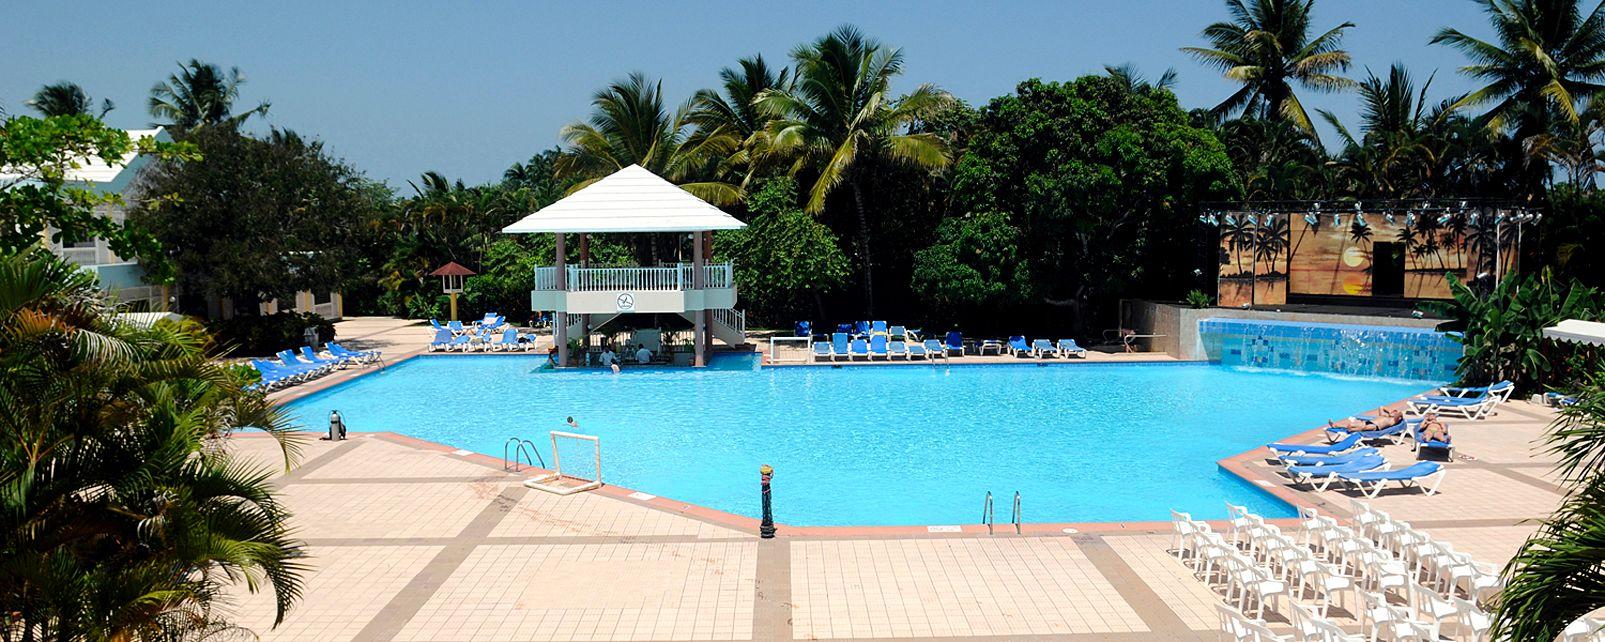 Hotel Puerto Plata Village Carribean Resort & Beach Club